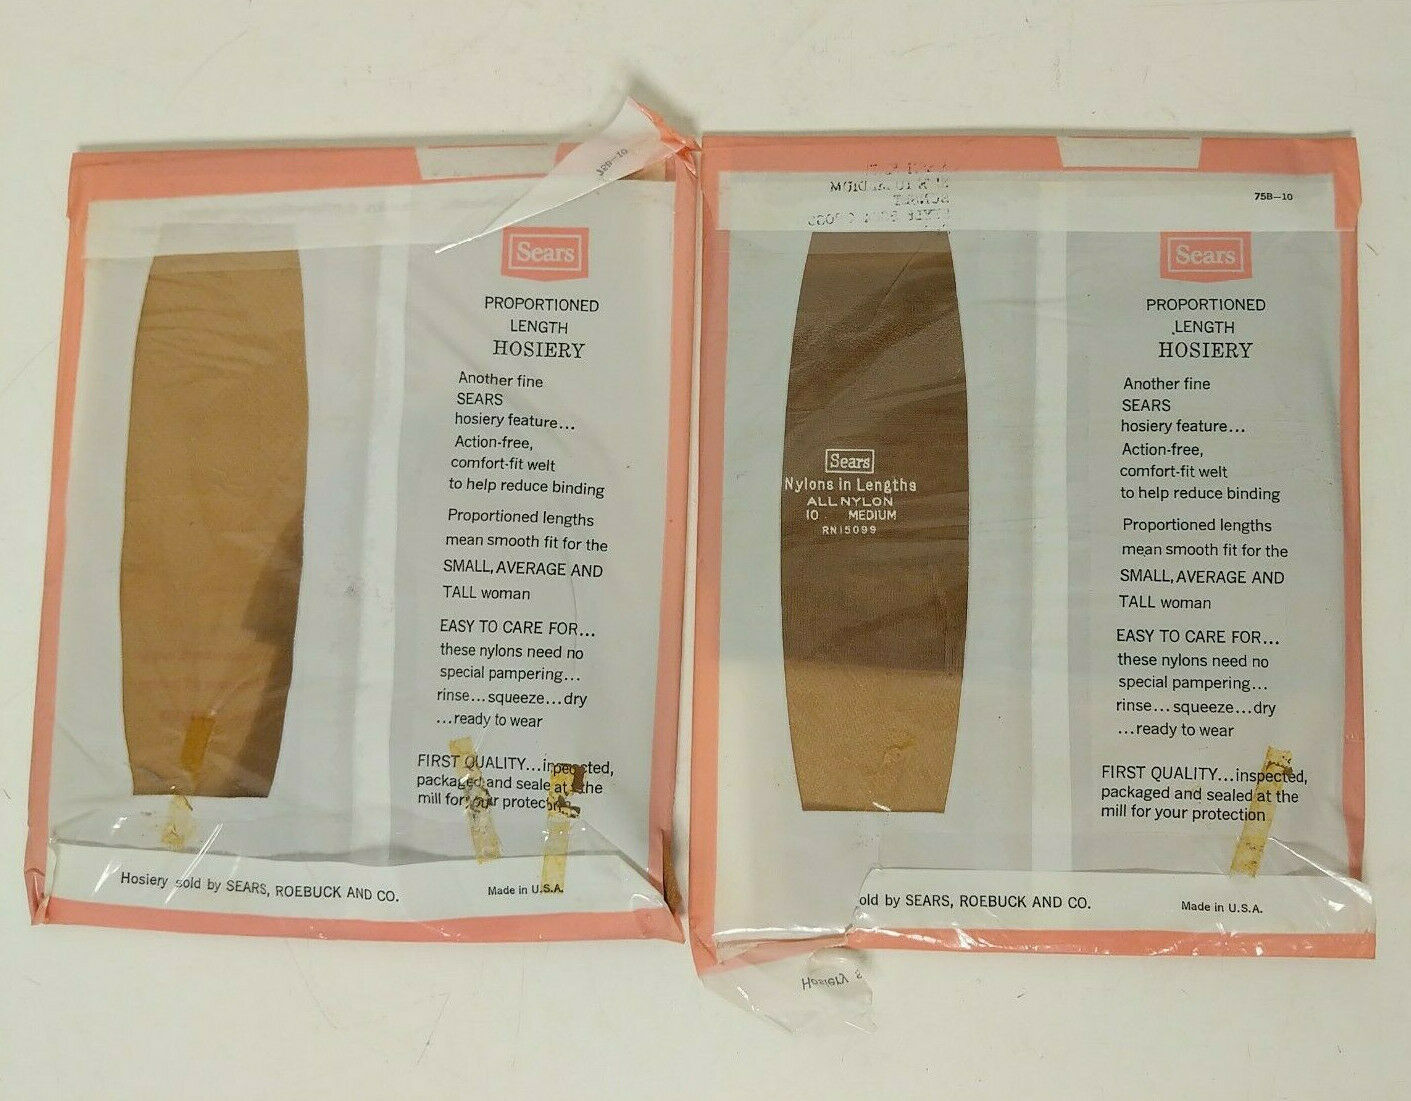 (2) Sears Ultra Sheer Seamless All Nylon Hosiery Mesh Knit Size 10 Style 5504